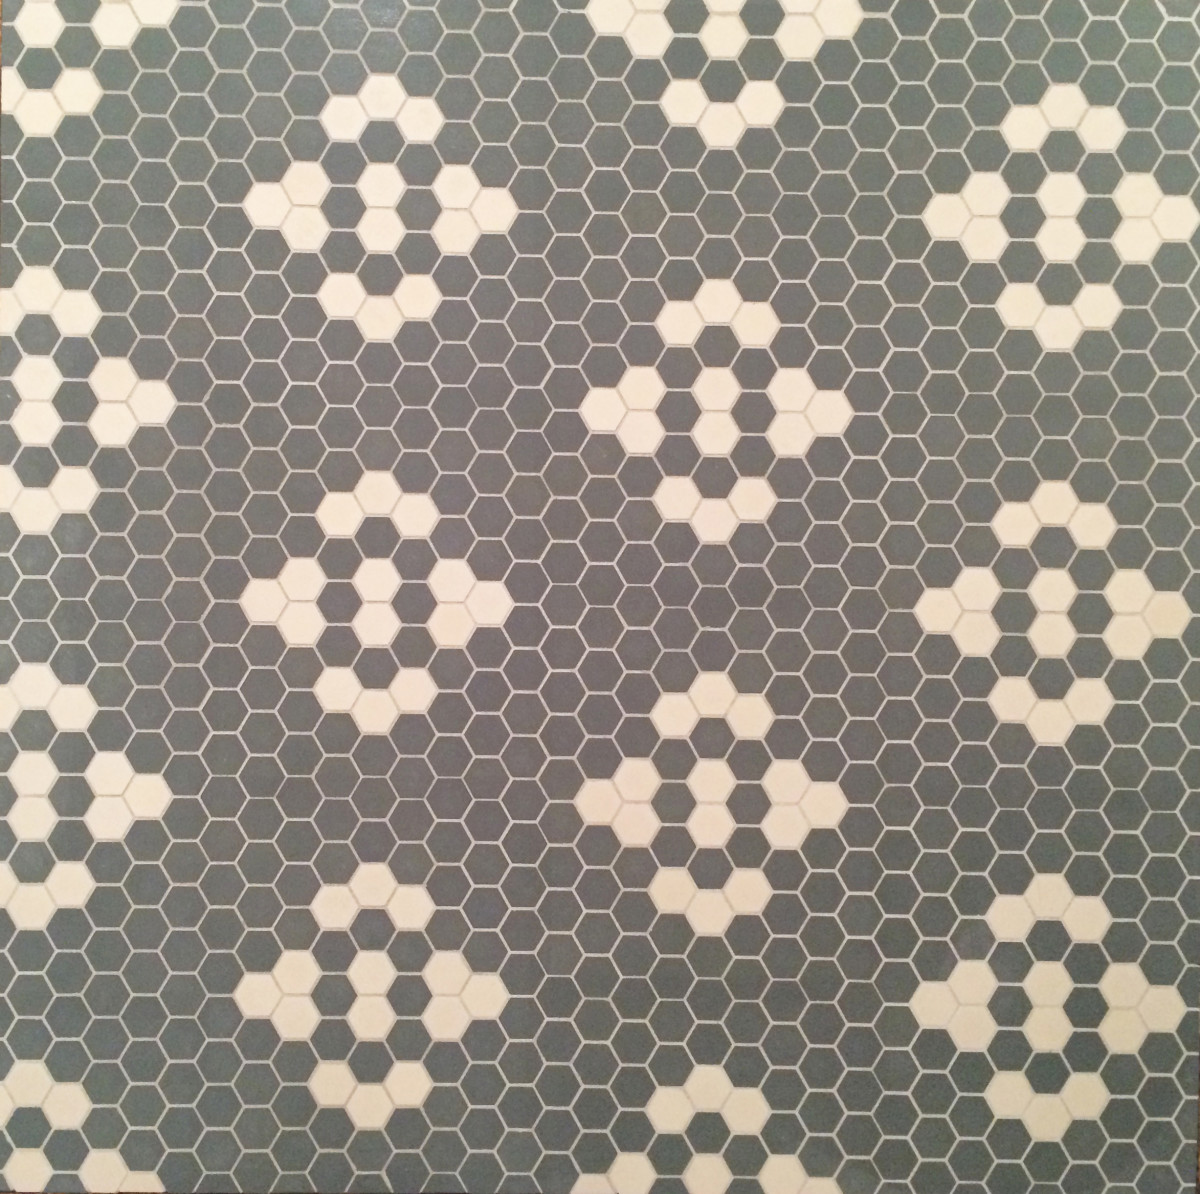 Sources for arts crafts tile design for the arts crafts house mosaic floor tile hex bath tile vintage floor tile dailygadgetfo Images